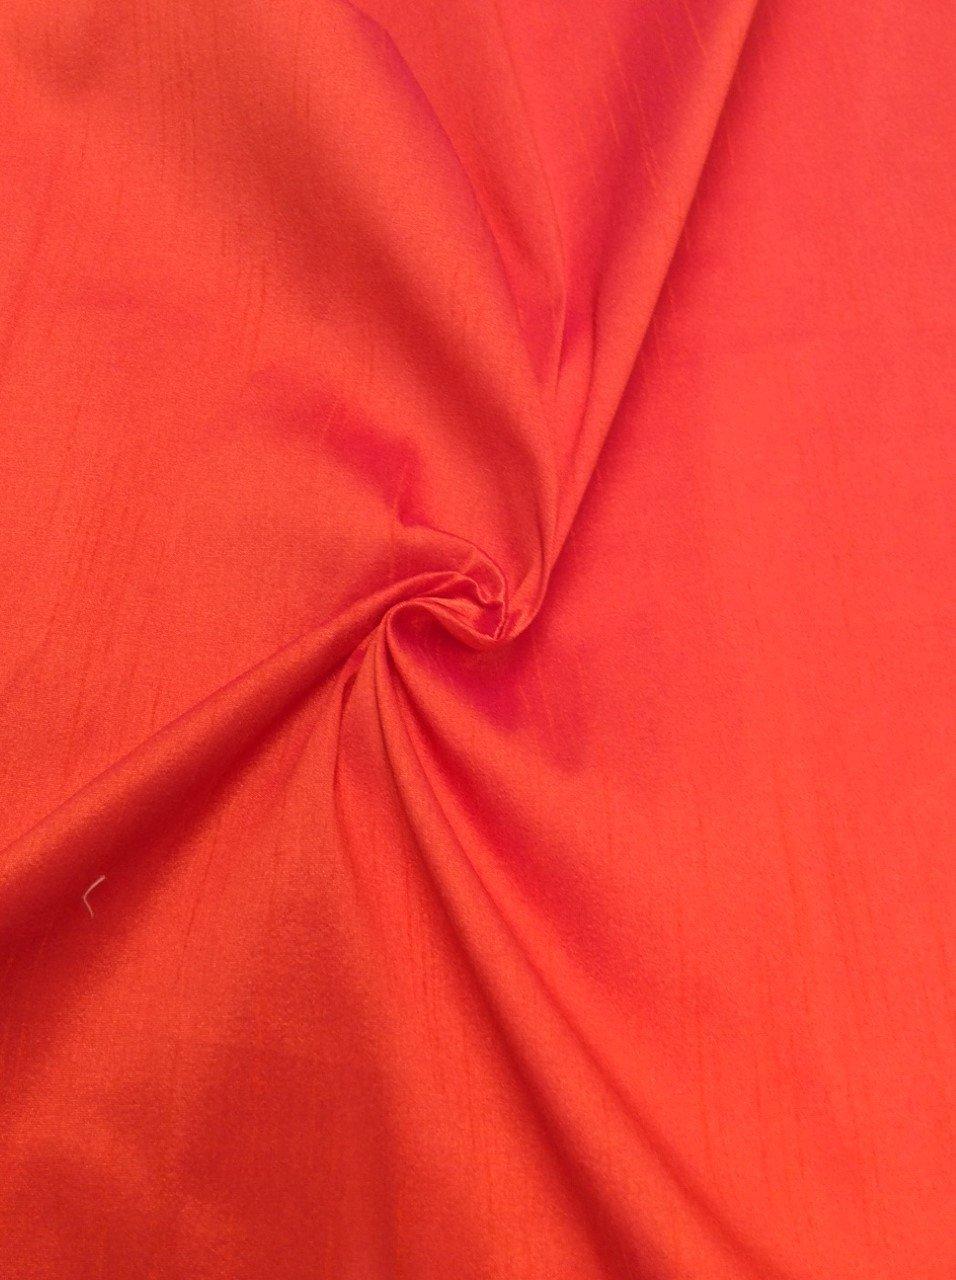 Red/Orange Taffeta